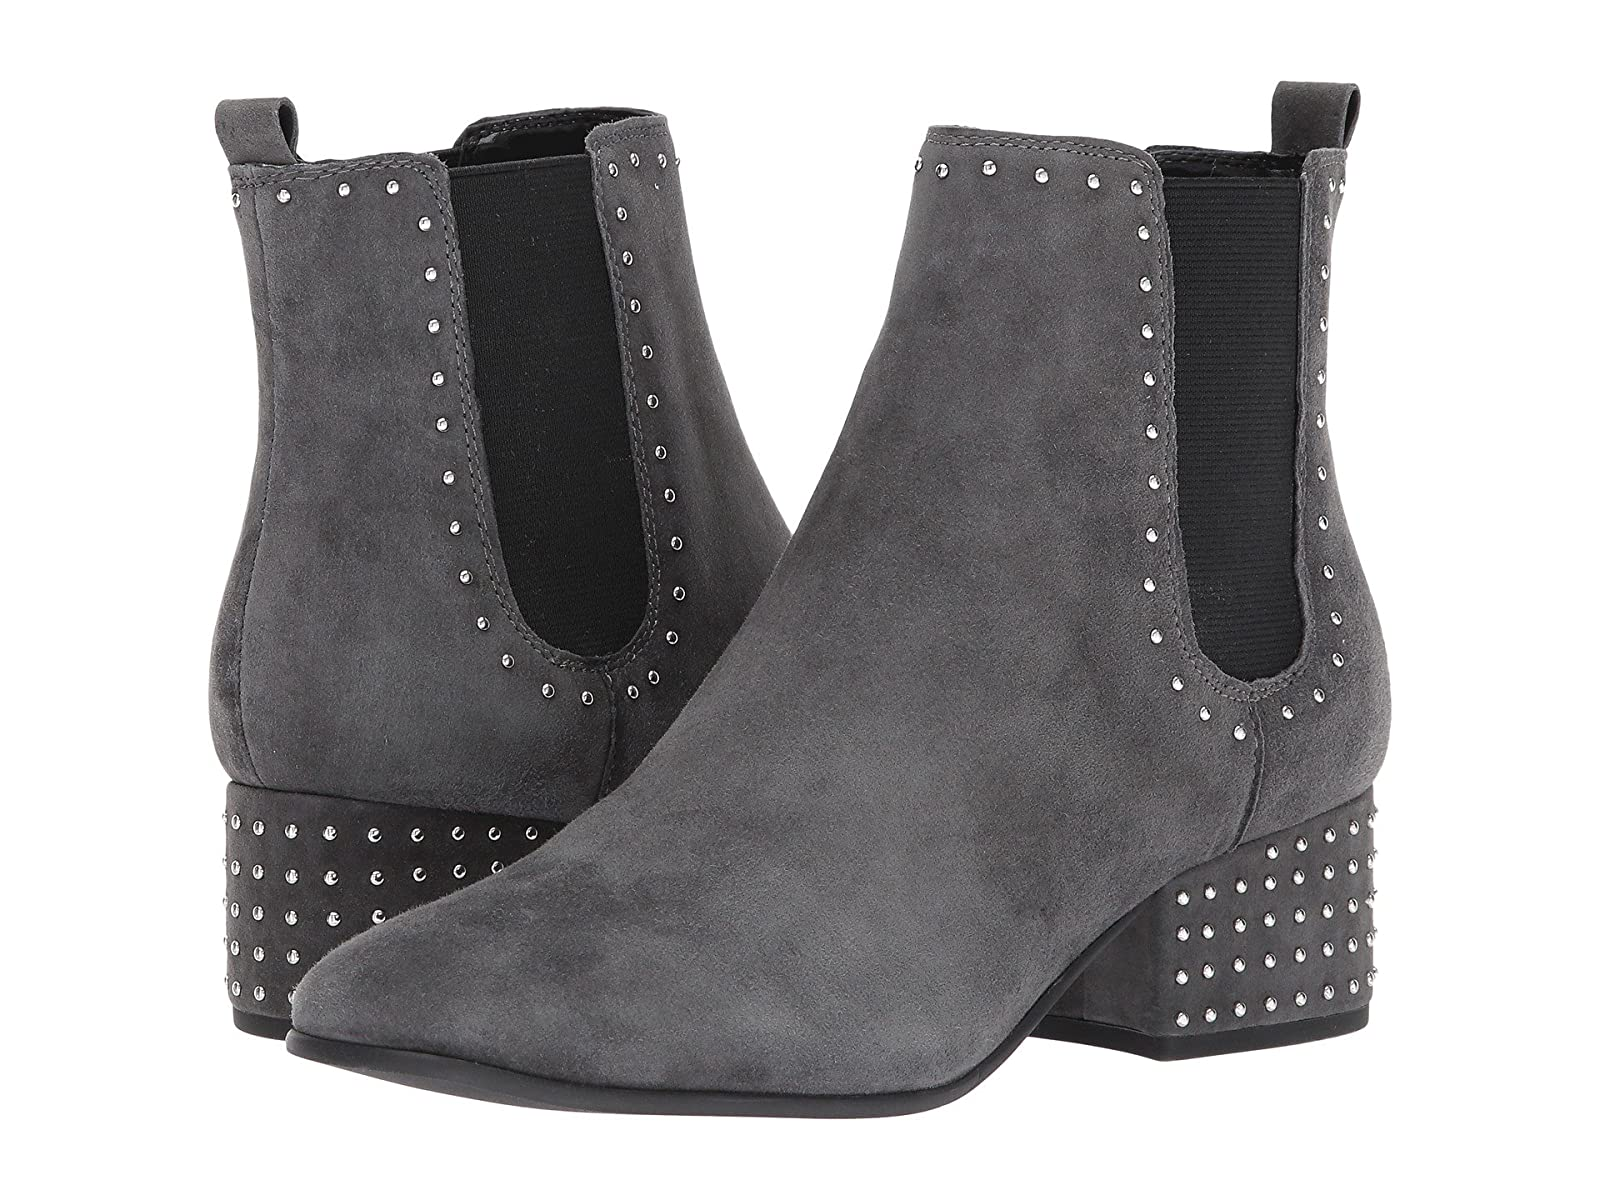 Marc Fisher LTD TangoCheap and distinctive eye-catching shoes